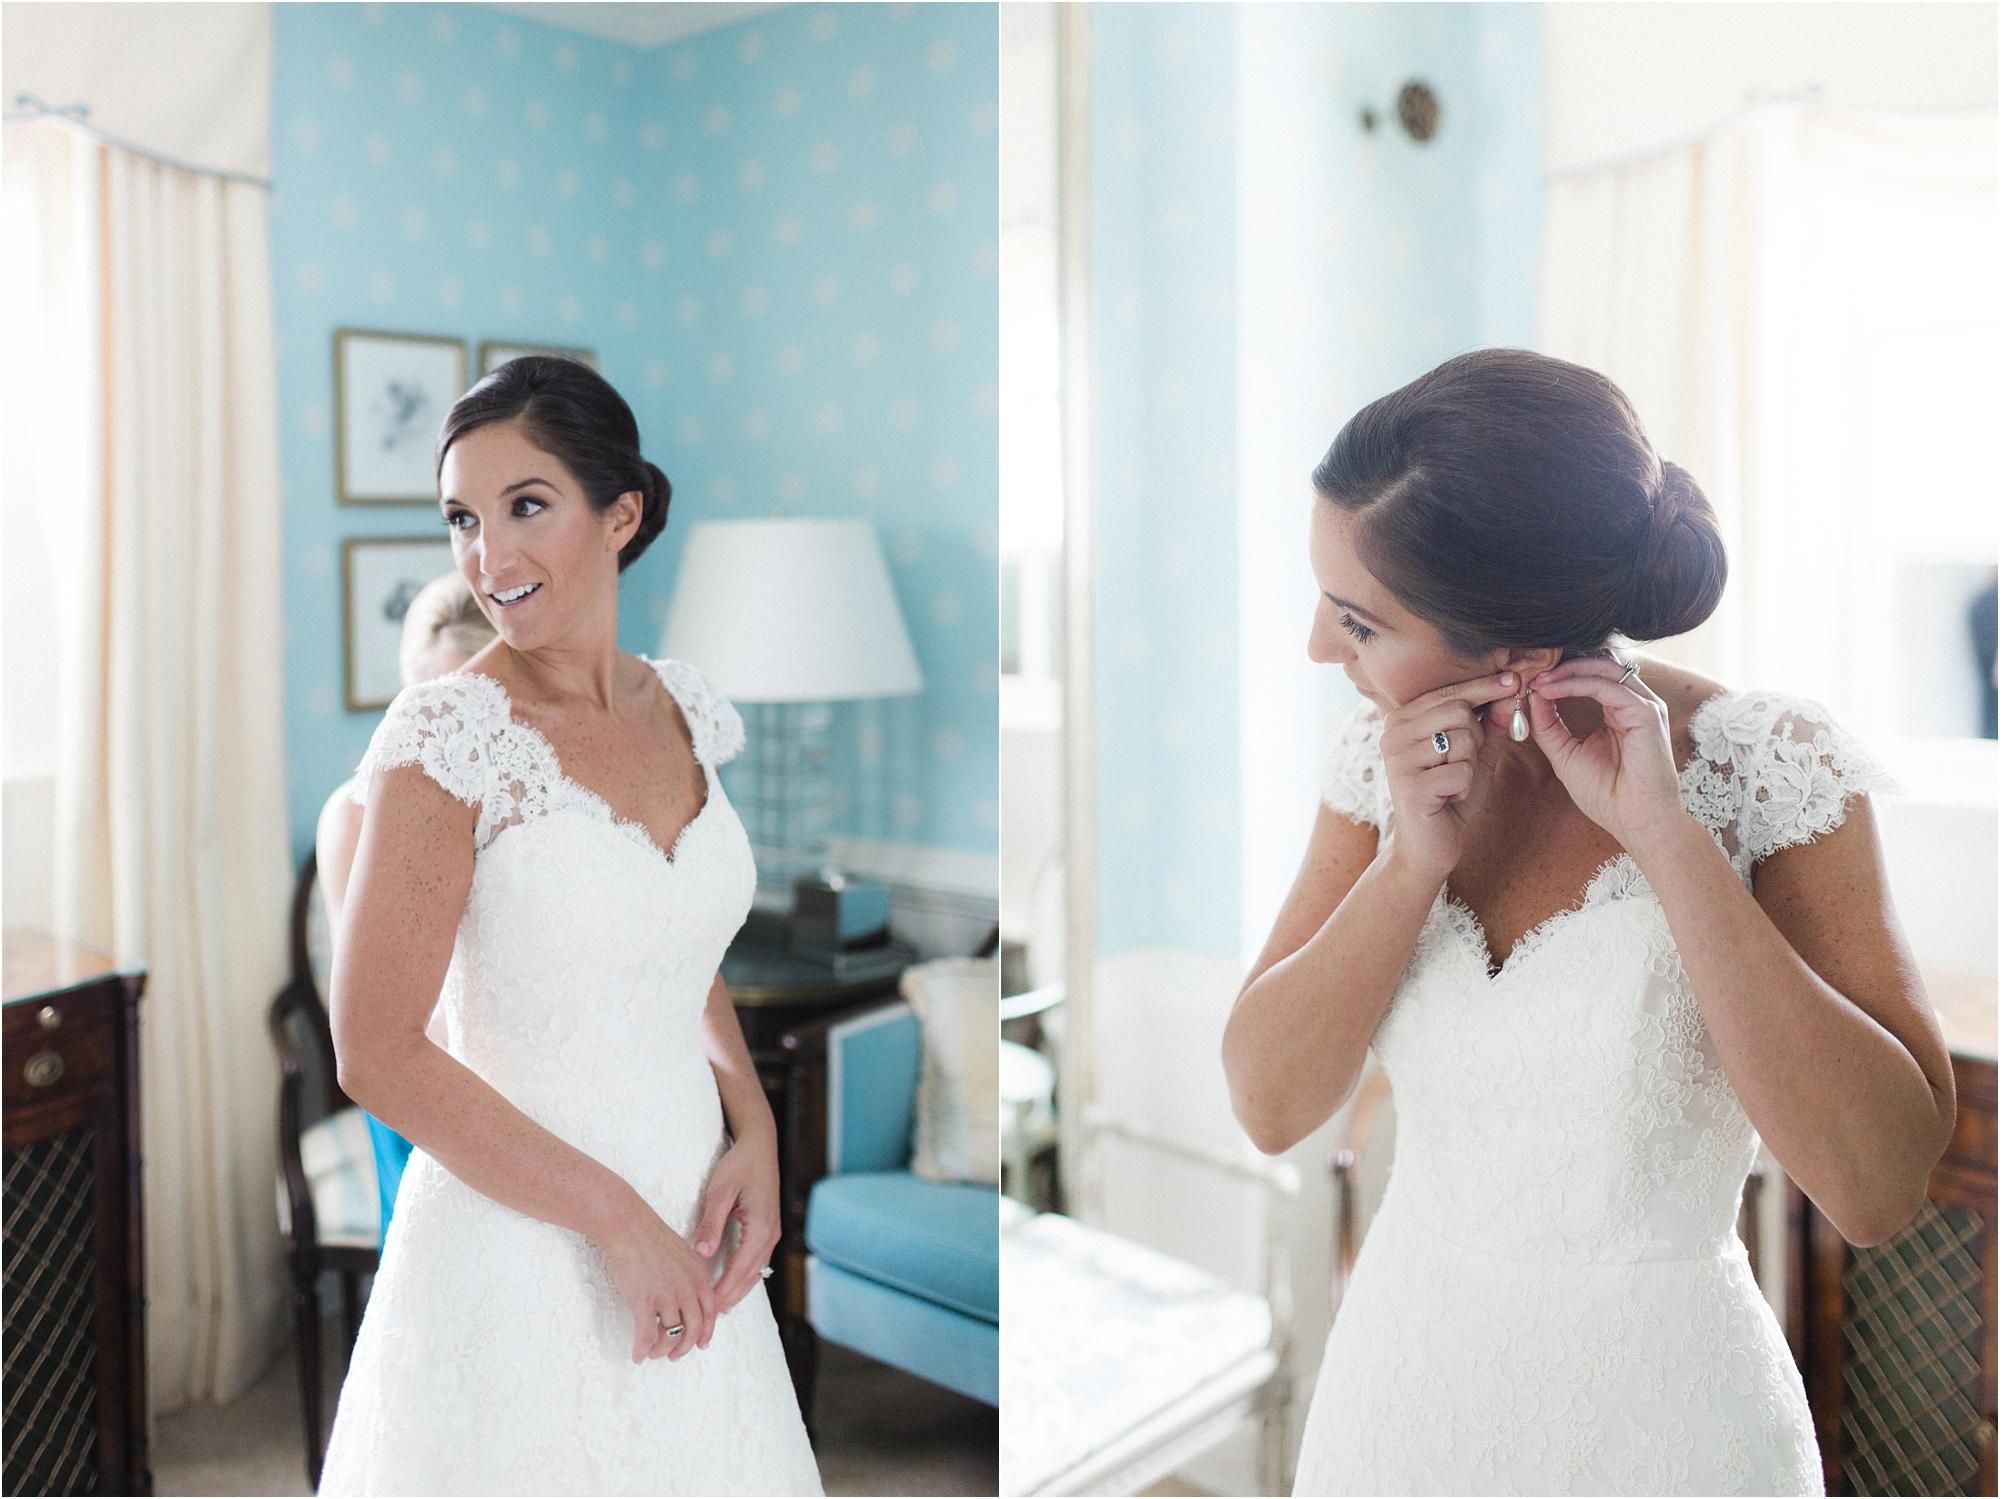 stephanie-yonce-photography-richmond-virginia-country-club-wedding-photo_006.JPG